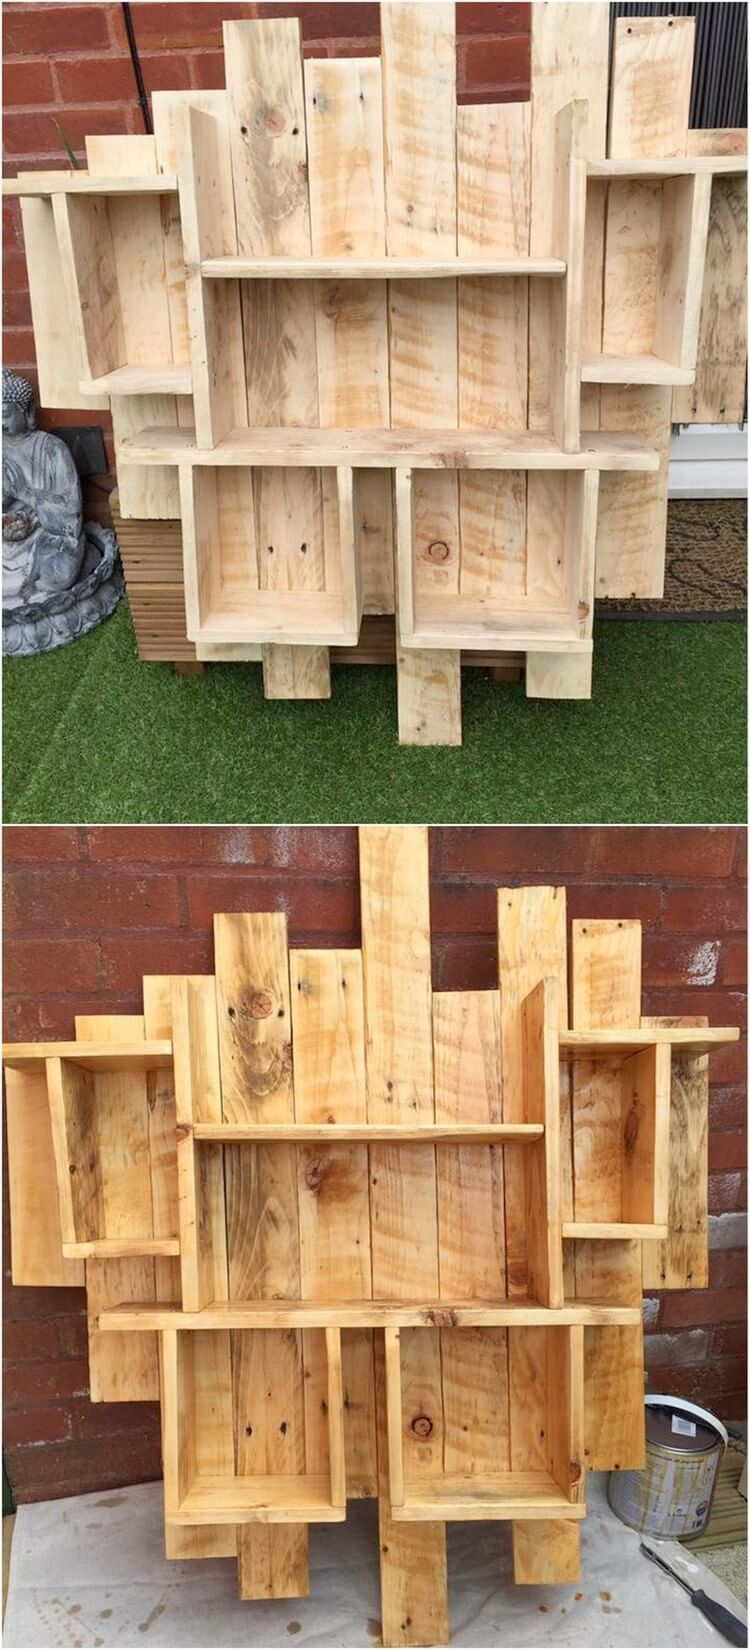 Wood Crafts Shelves Shelf Ideas Diy Pallet Projects Pallet Wood